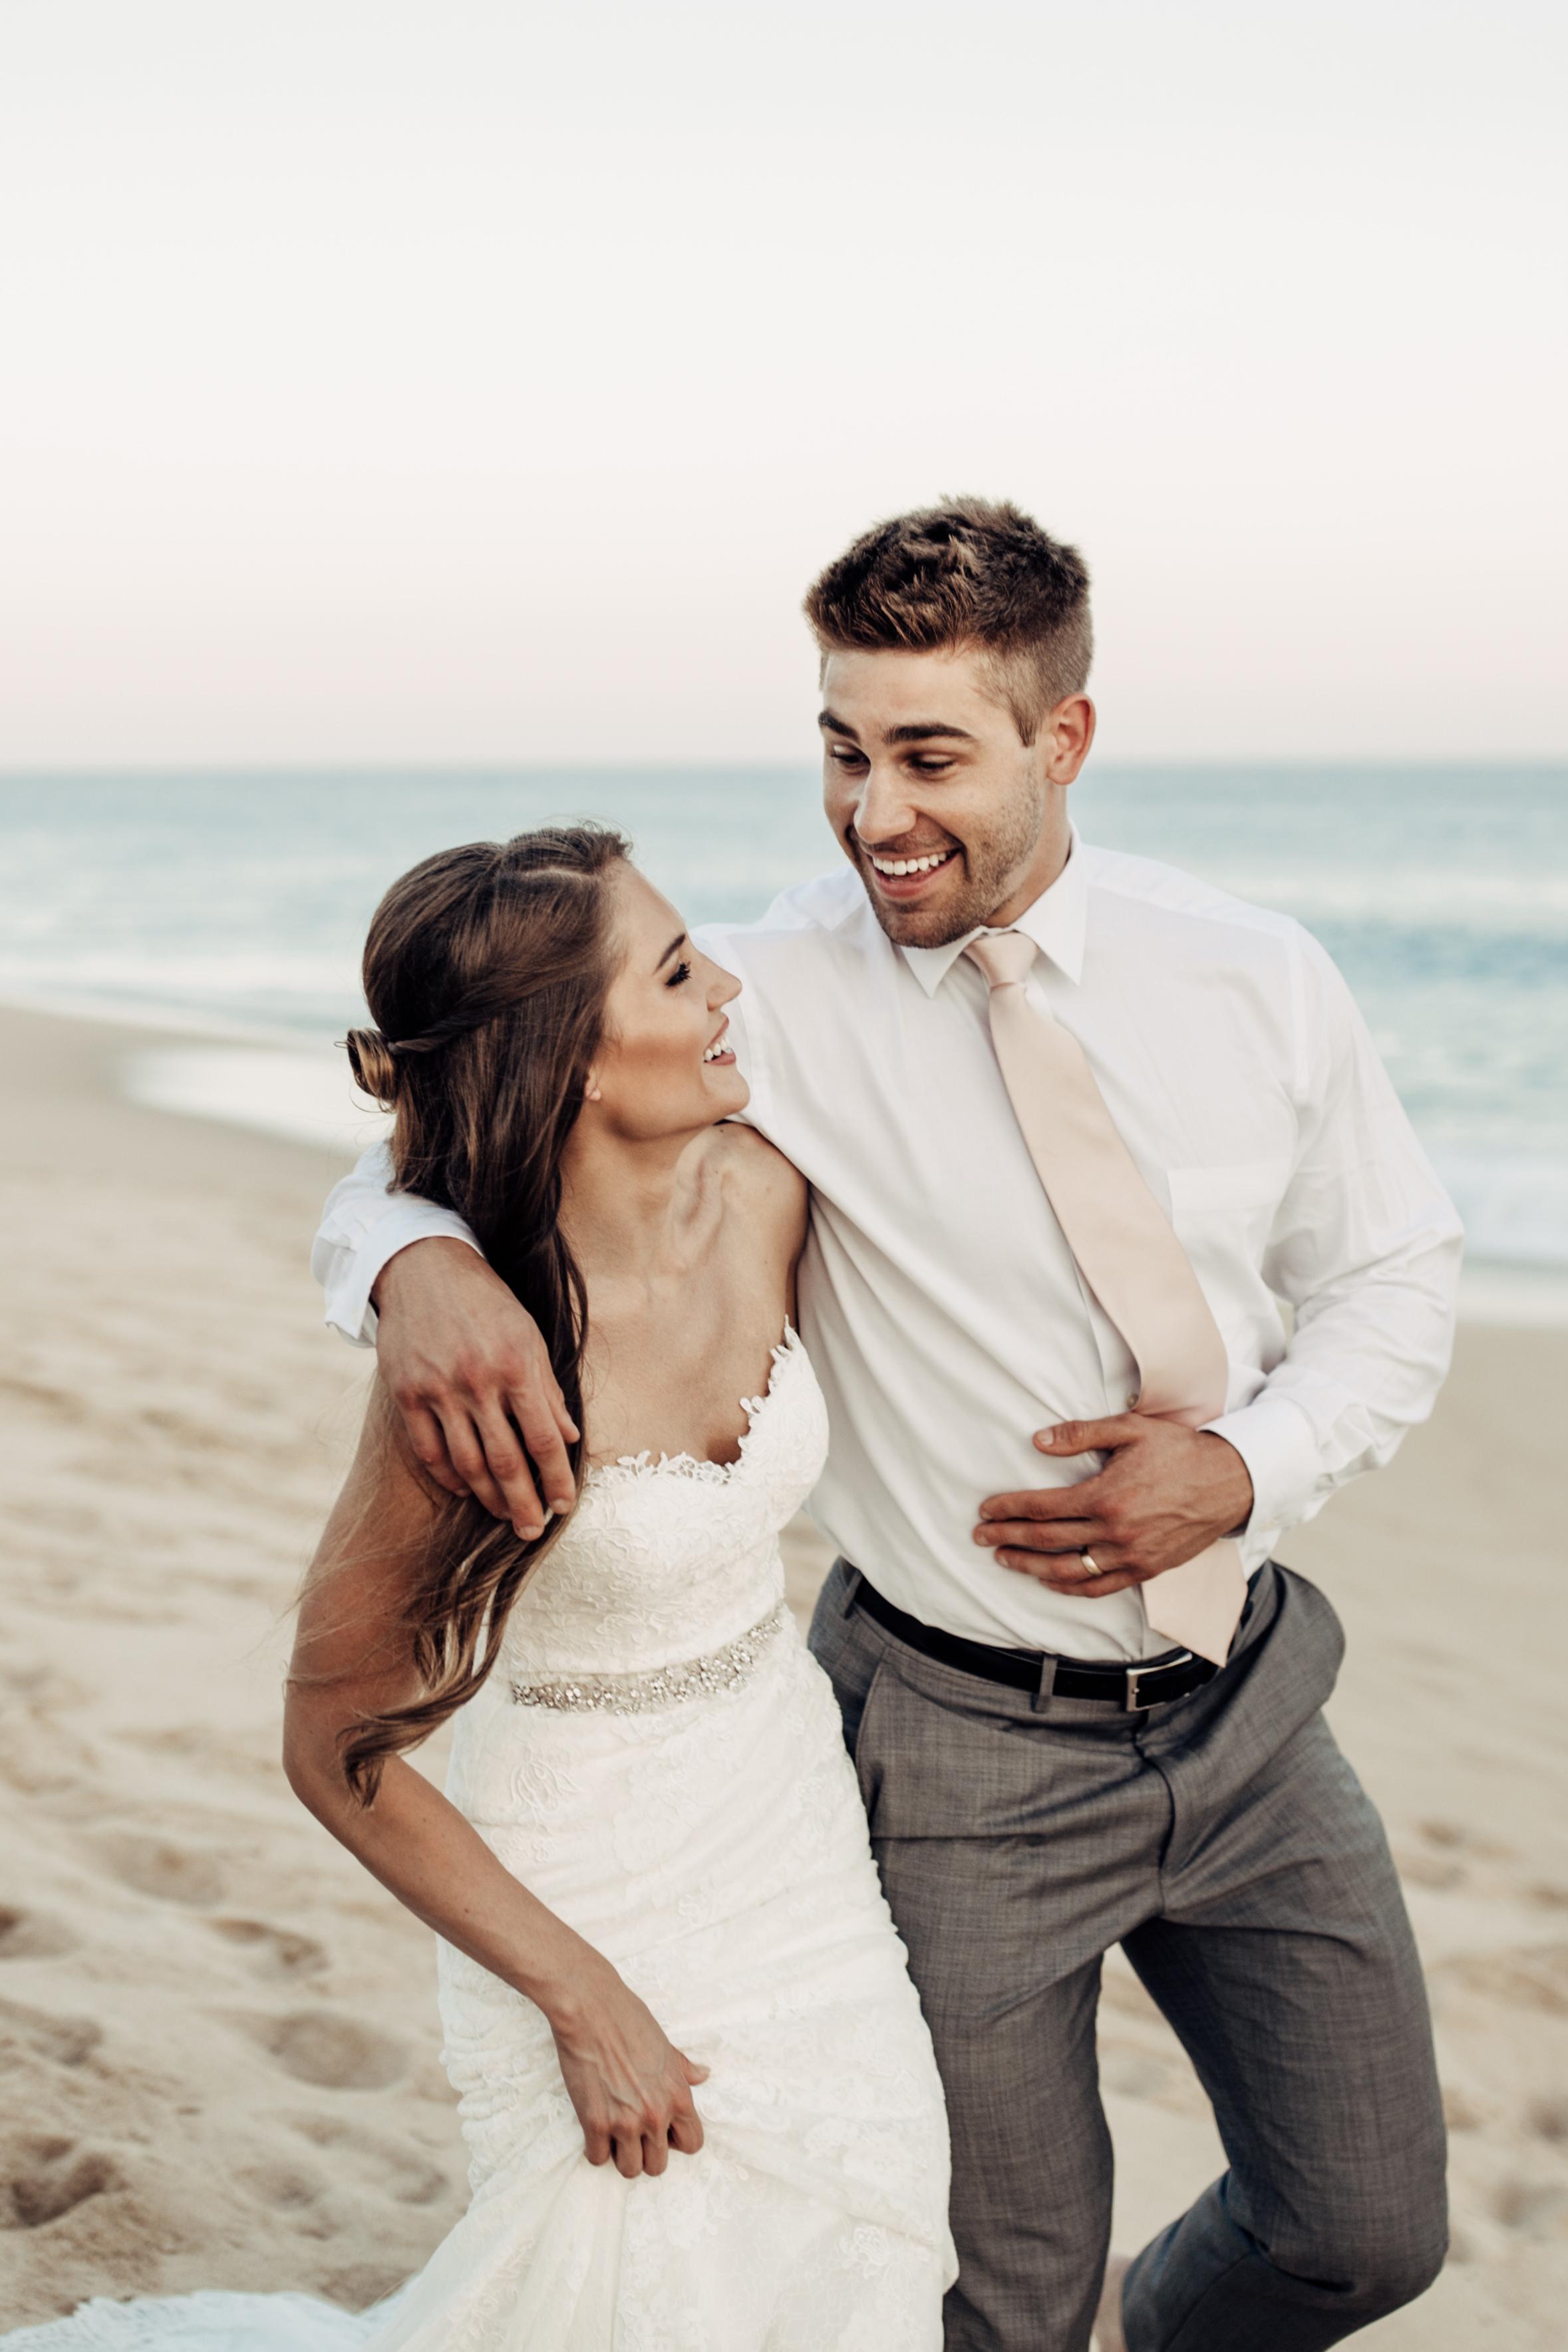 pueblo-bonito-sunset-beach-wedding-cabo-san-lucas507.jpg